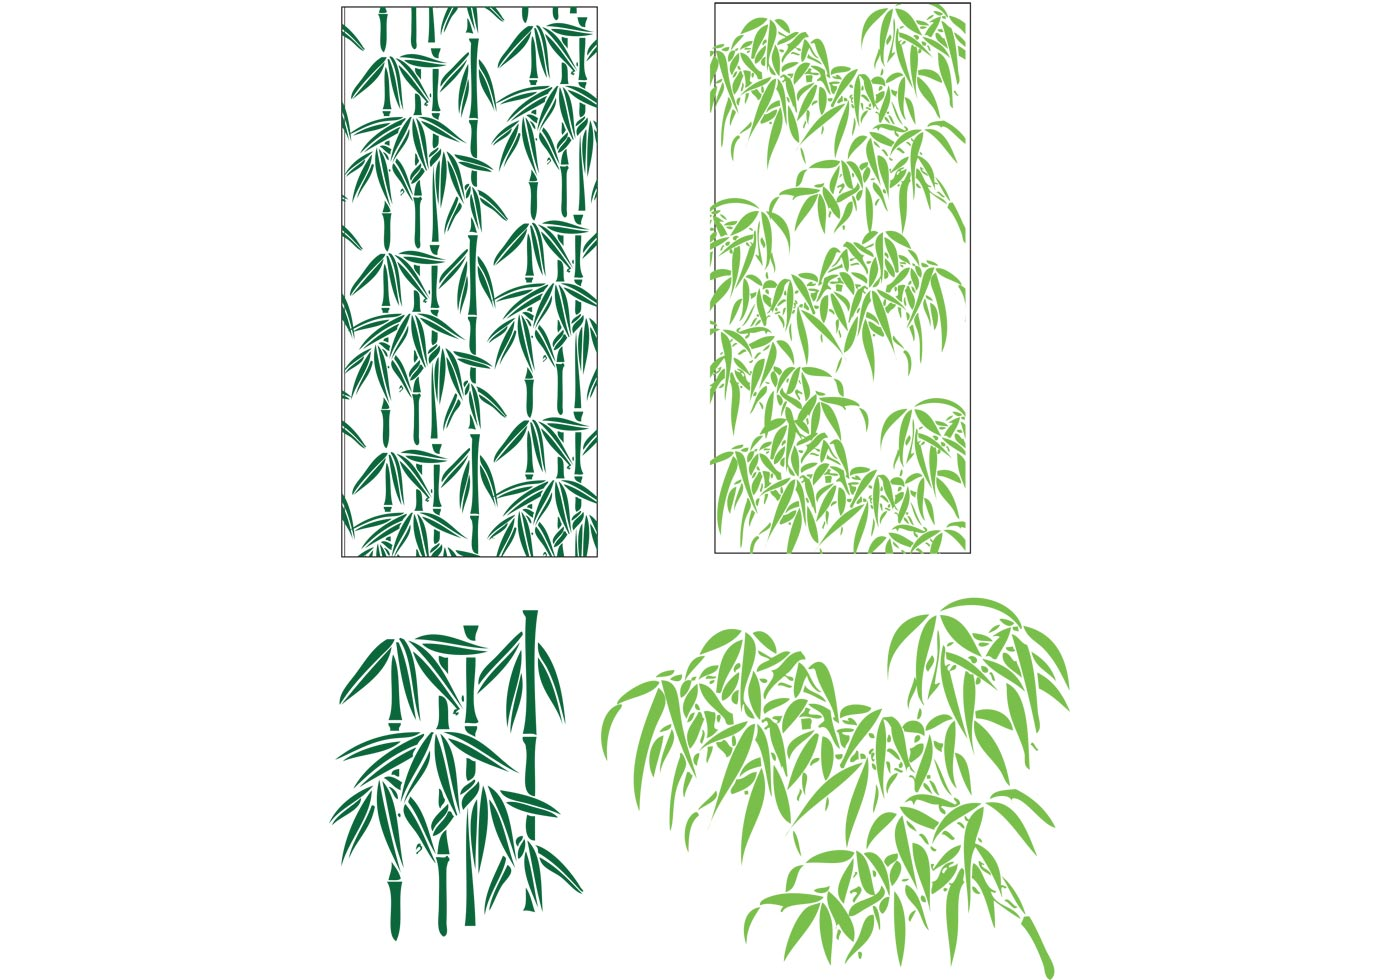 Maple Leaf Wallpaper For Fall Season Free Bamboo Leaves Vector